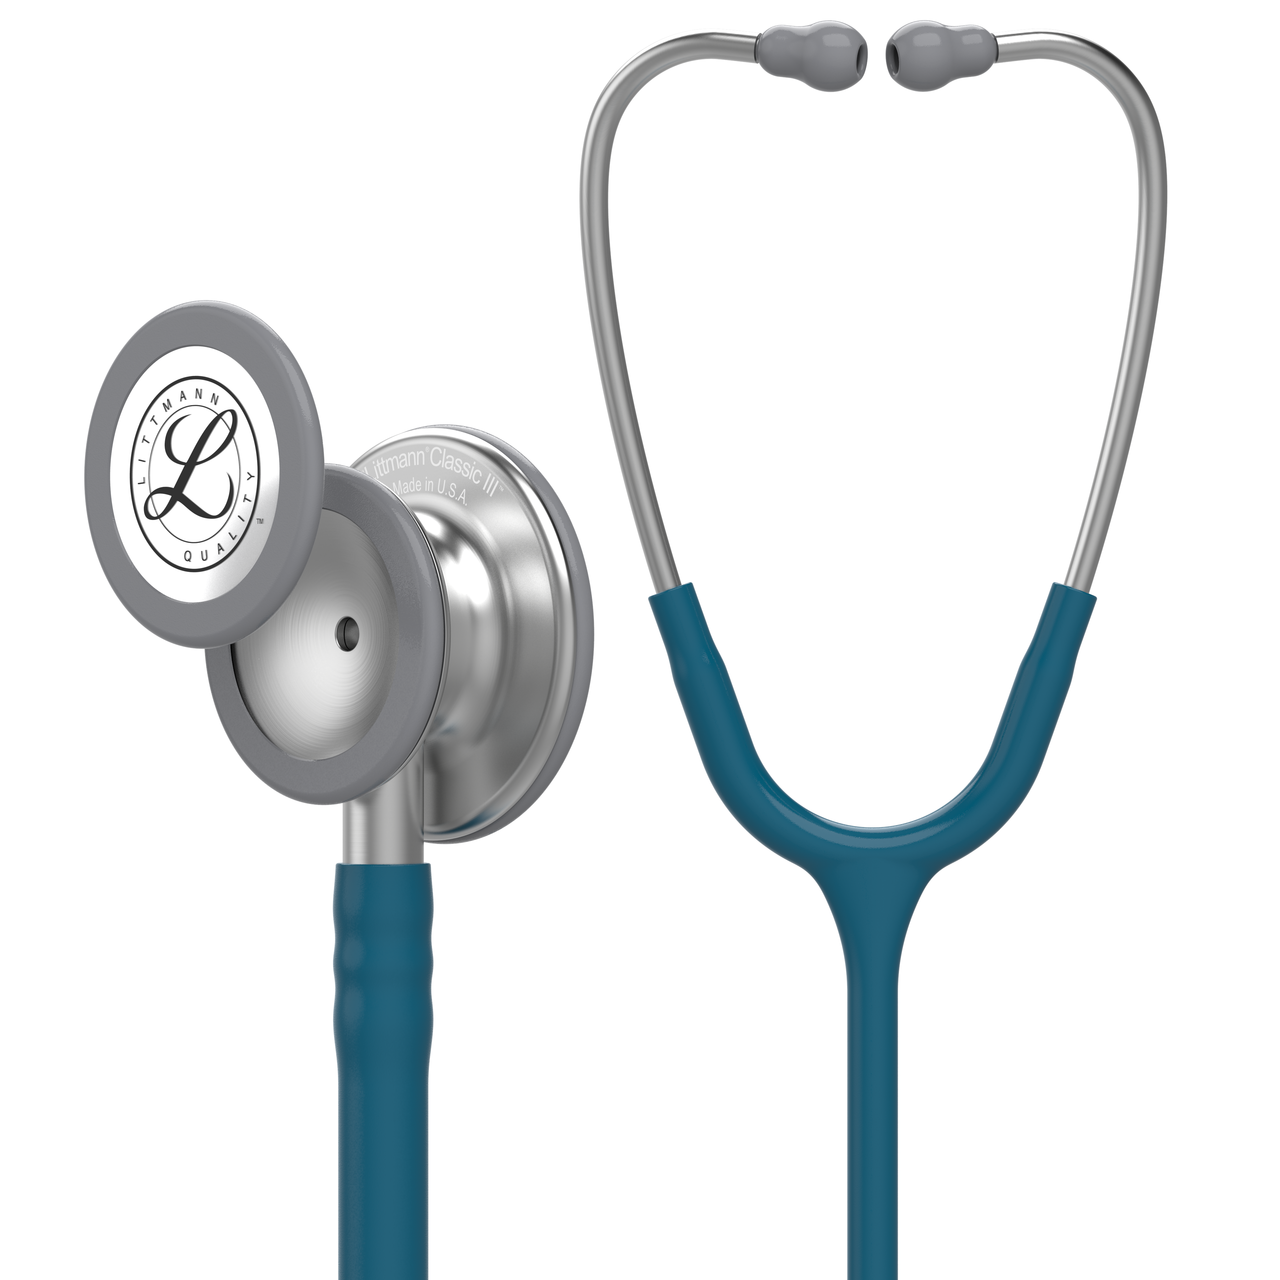 Littmann Classic III Stethoscope, Caribbean Blue, 5623